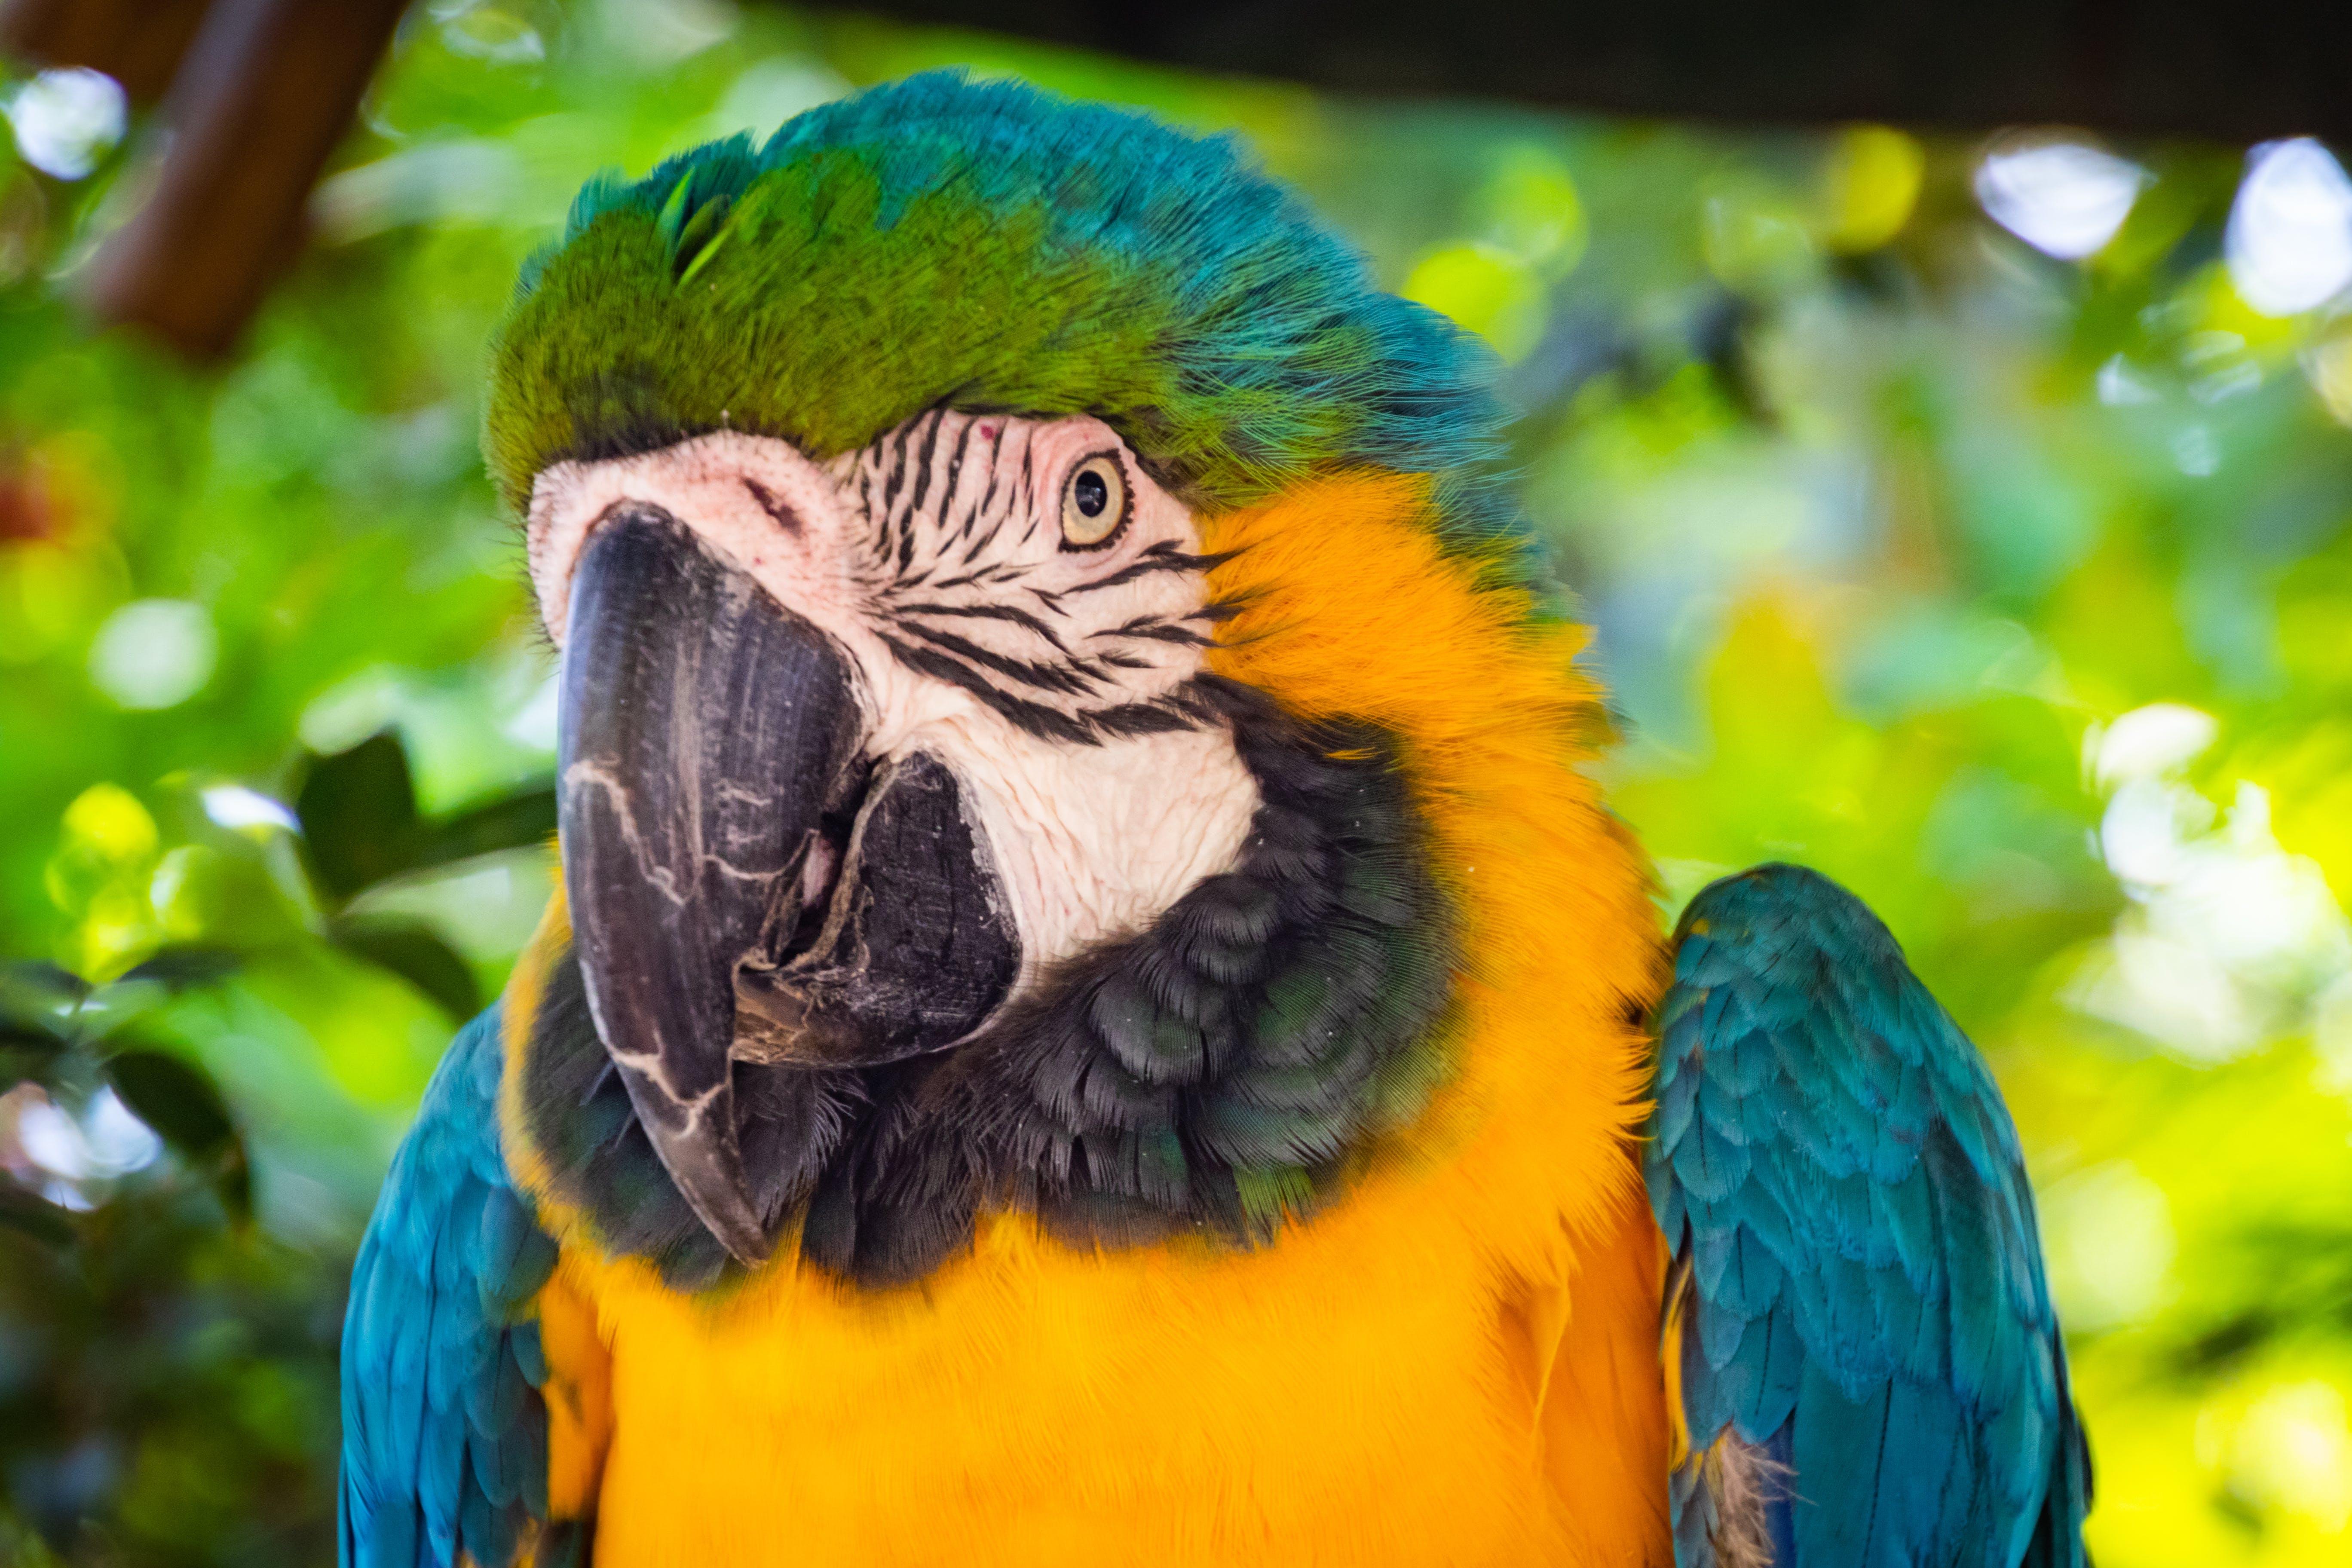 Kostnadsfri bild av ara, djur, djurpark, exotisk